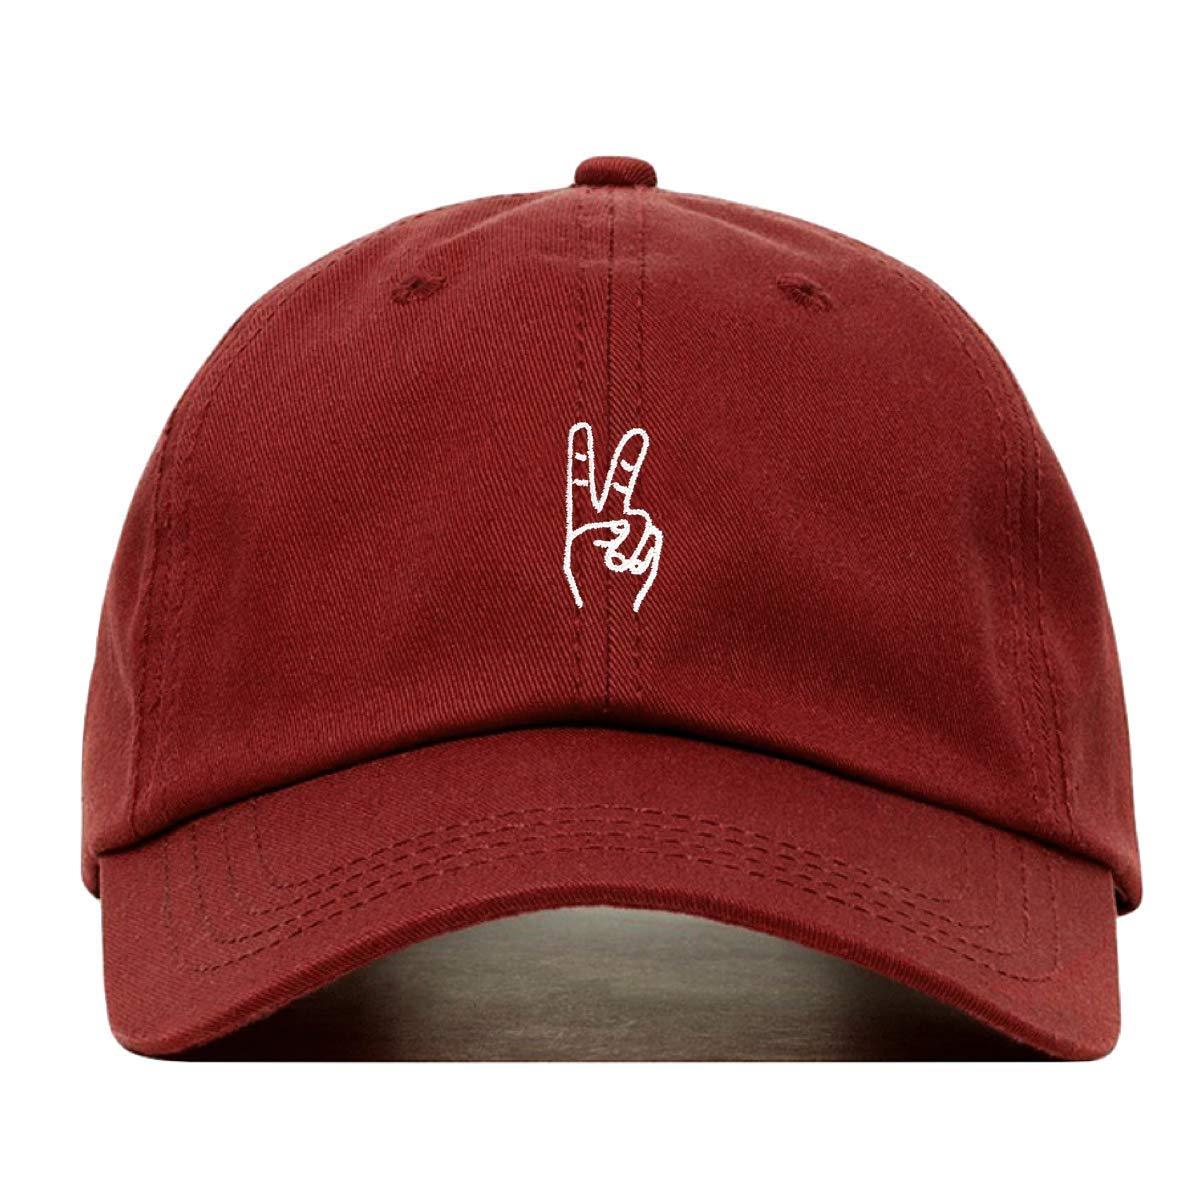 faire broderie HAT ユニセックスアダルト  バーガンディー B079V79GM8